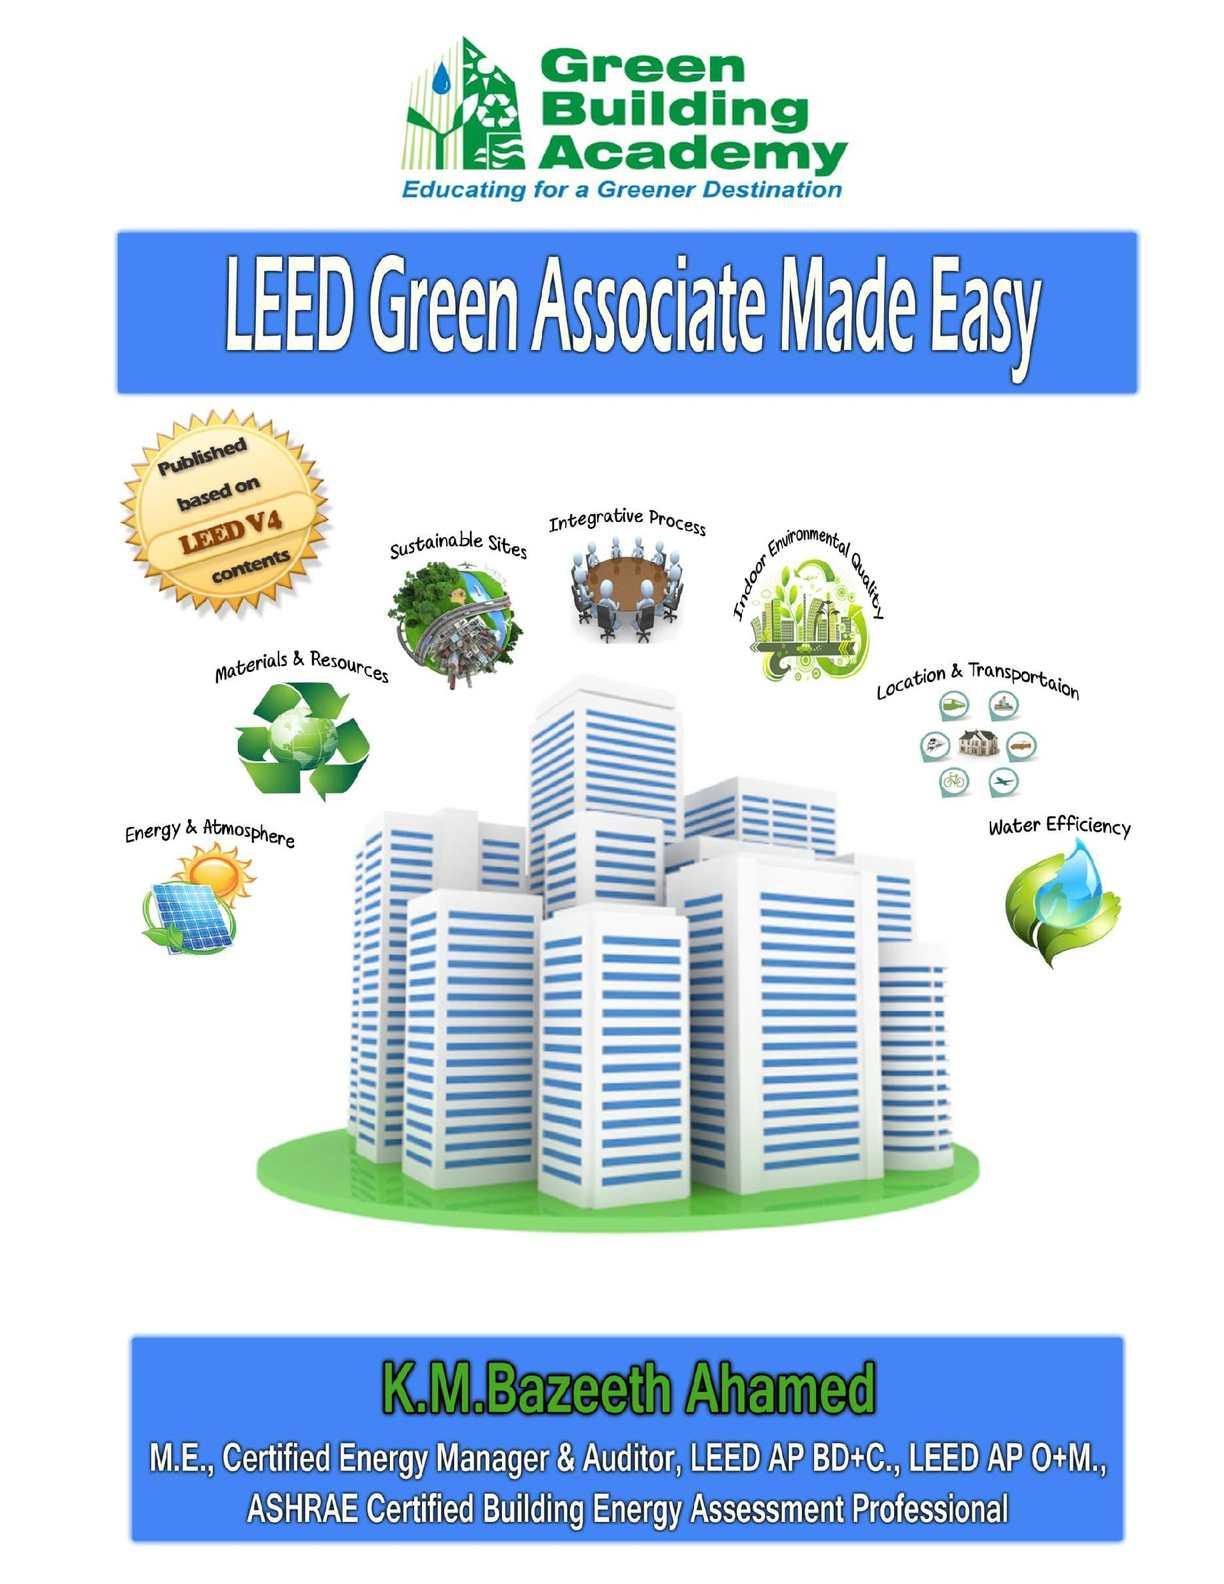 Calamo Free Leed Green Associate Made Easy V4 Study Guide